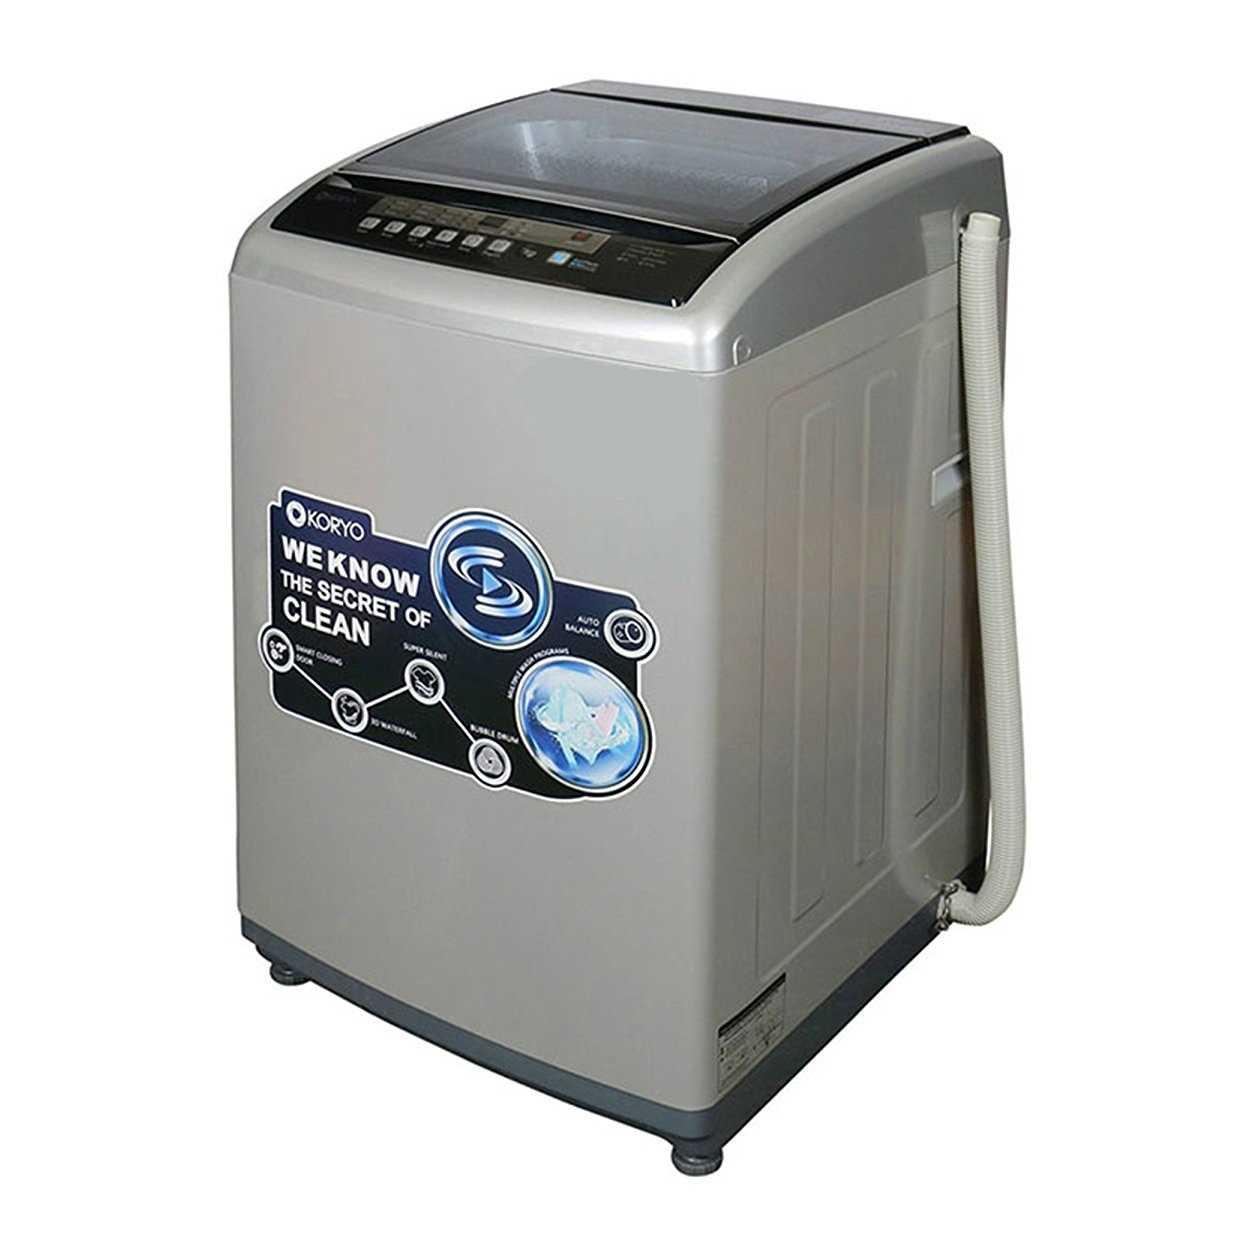 Koryo KWM1000TL 10 Kg Fully Automatic Top Loading Washing Machine